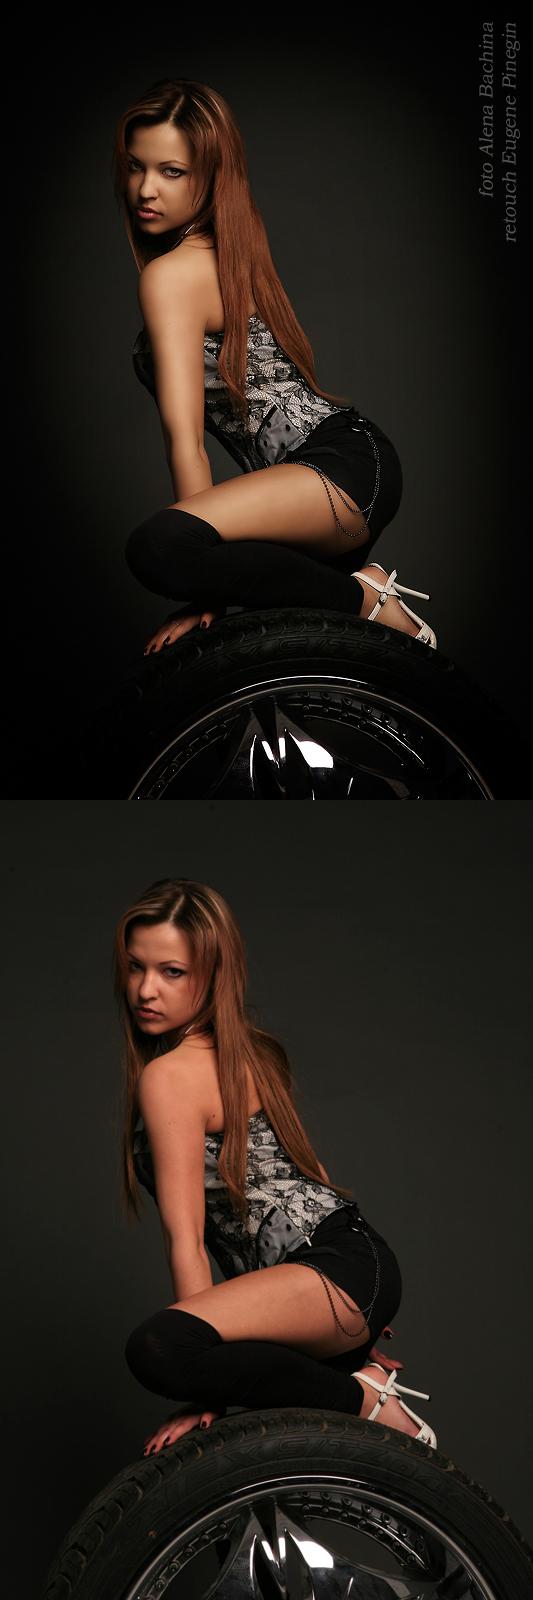 Male model photo shoot of Yevgeny Pinegin